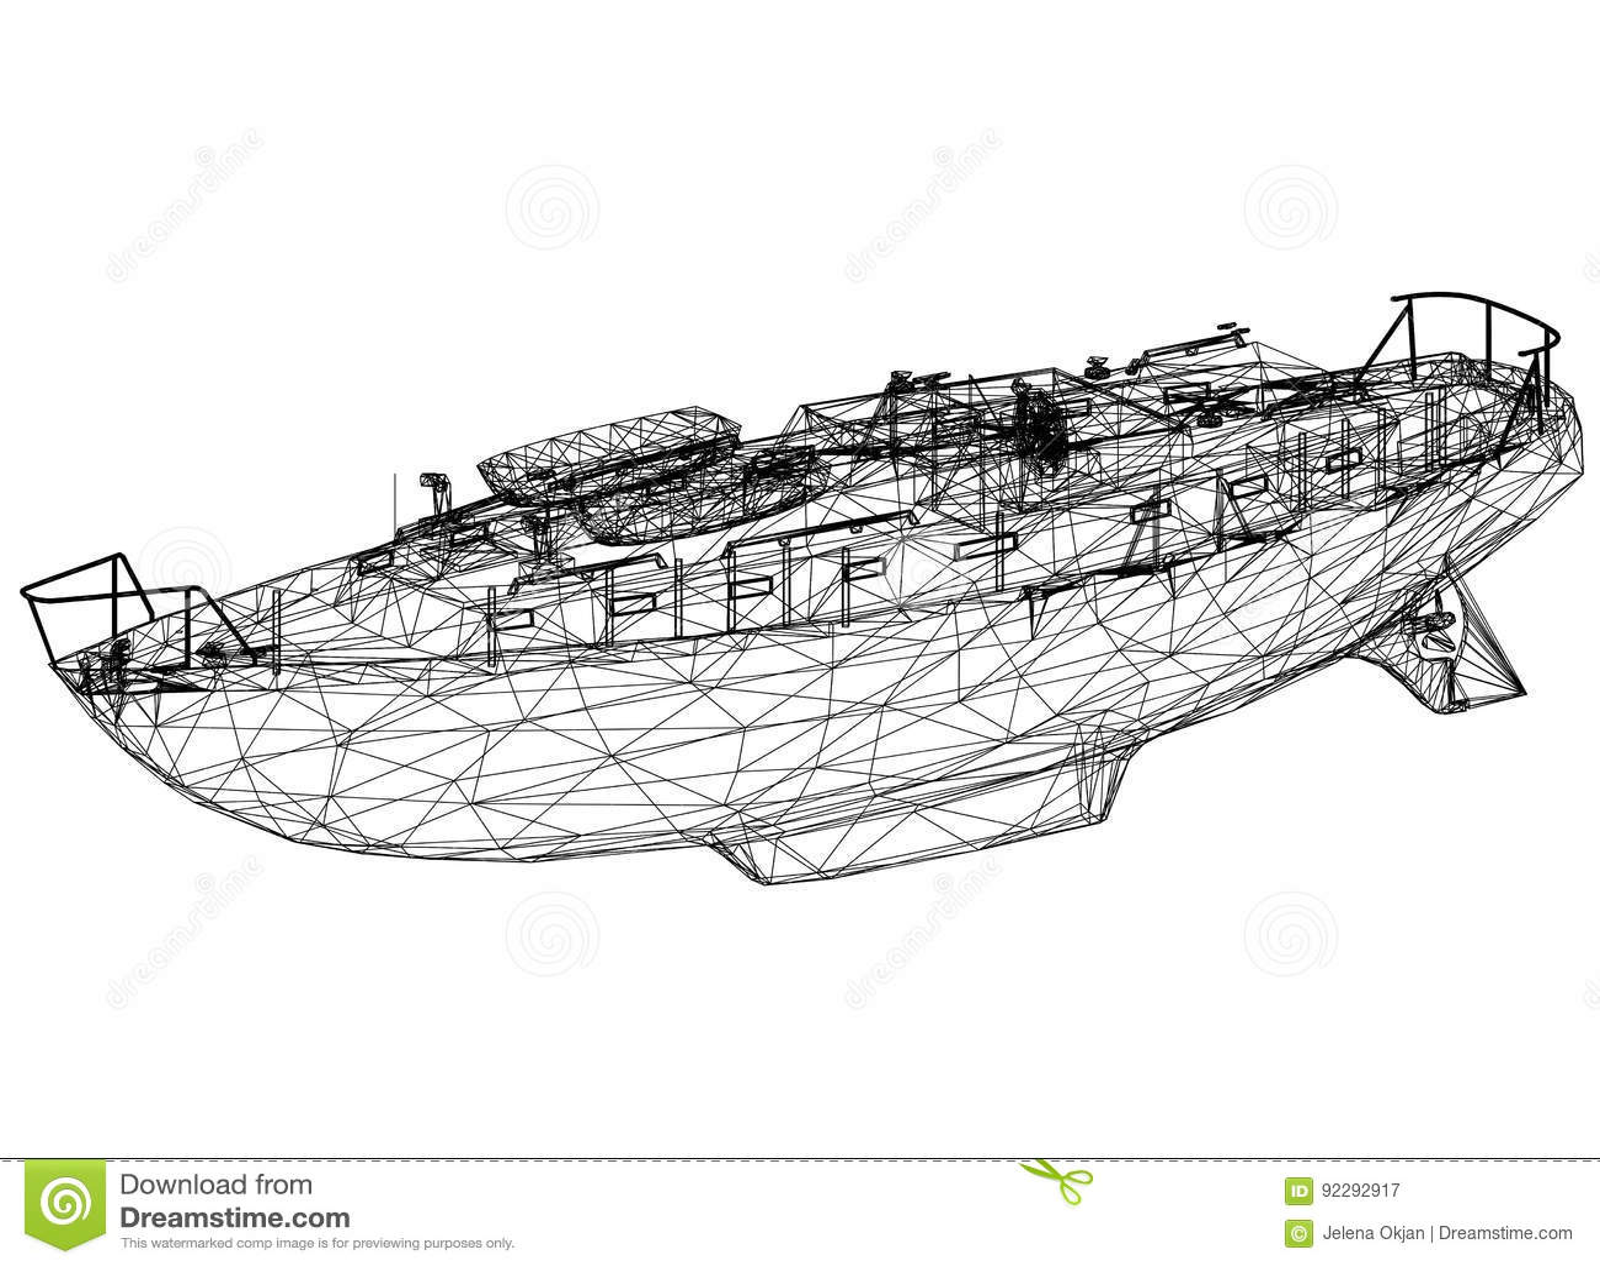 Boat blueprint 3d perspective stock illustration illustration of download boat blueprint 3d perspective stock illustration illustration of blueprint regatta 92292917 malvernweather Gallery